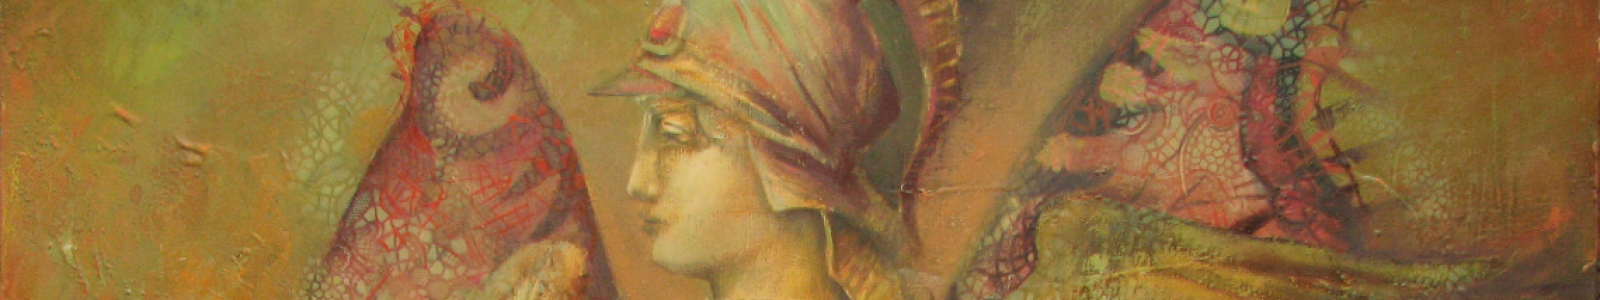 Gallery Painter Vasyl Zhivoglyad